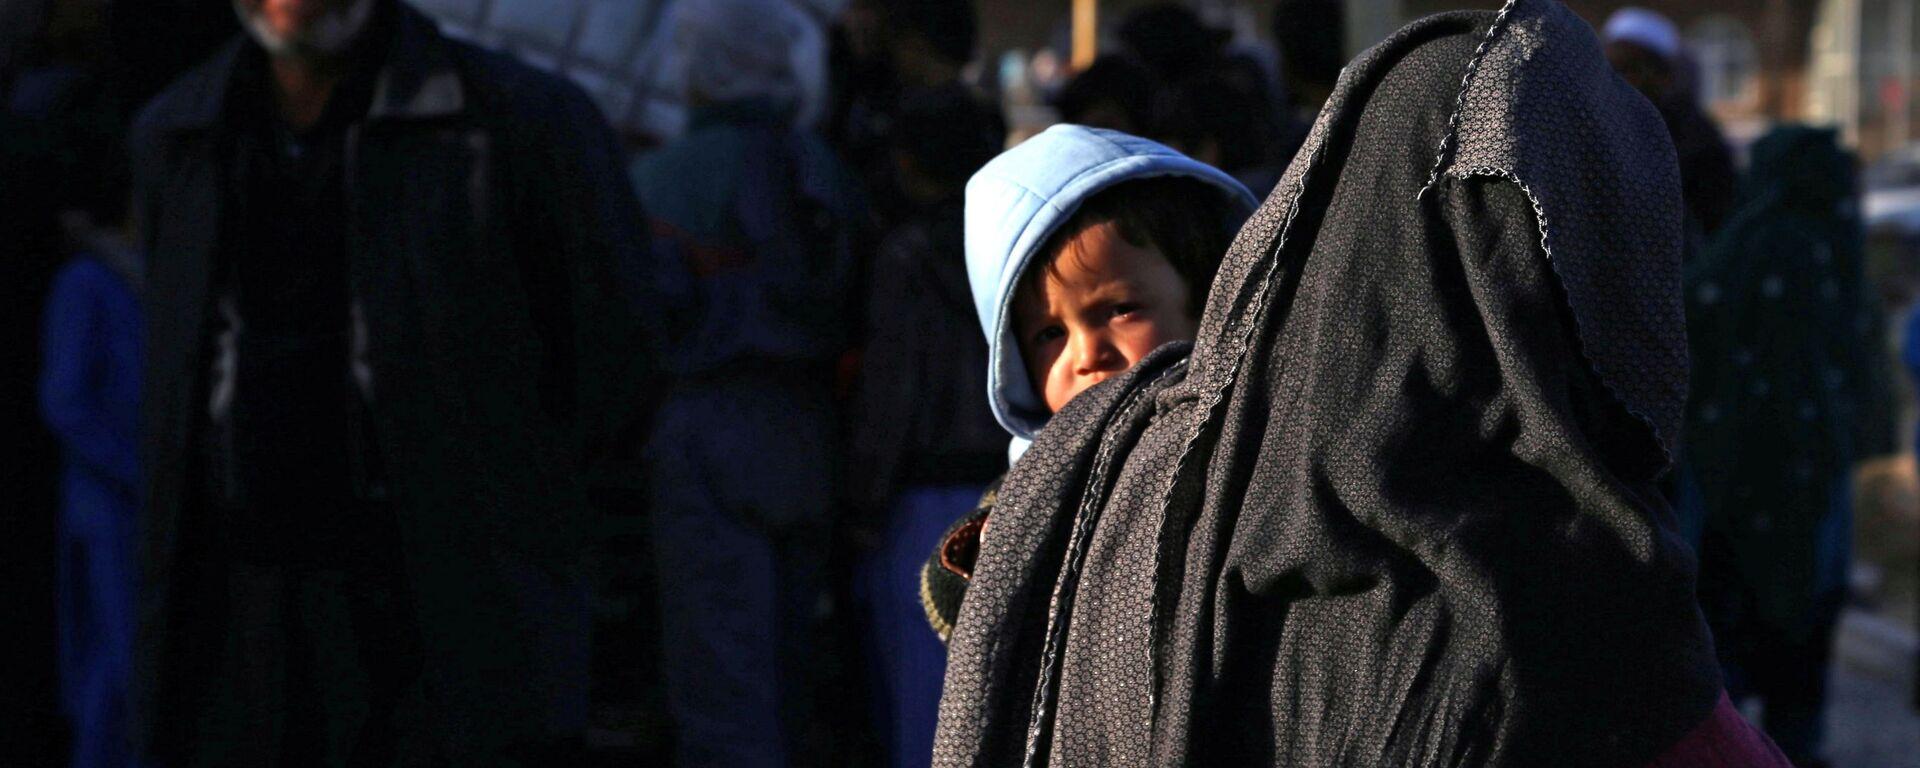 Беженцы из провинции Газни в Афганистане - Sputnik Таджикистан, 1920, 23.07.2021